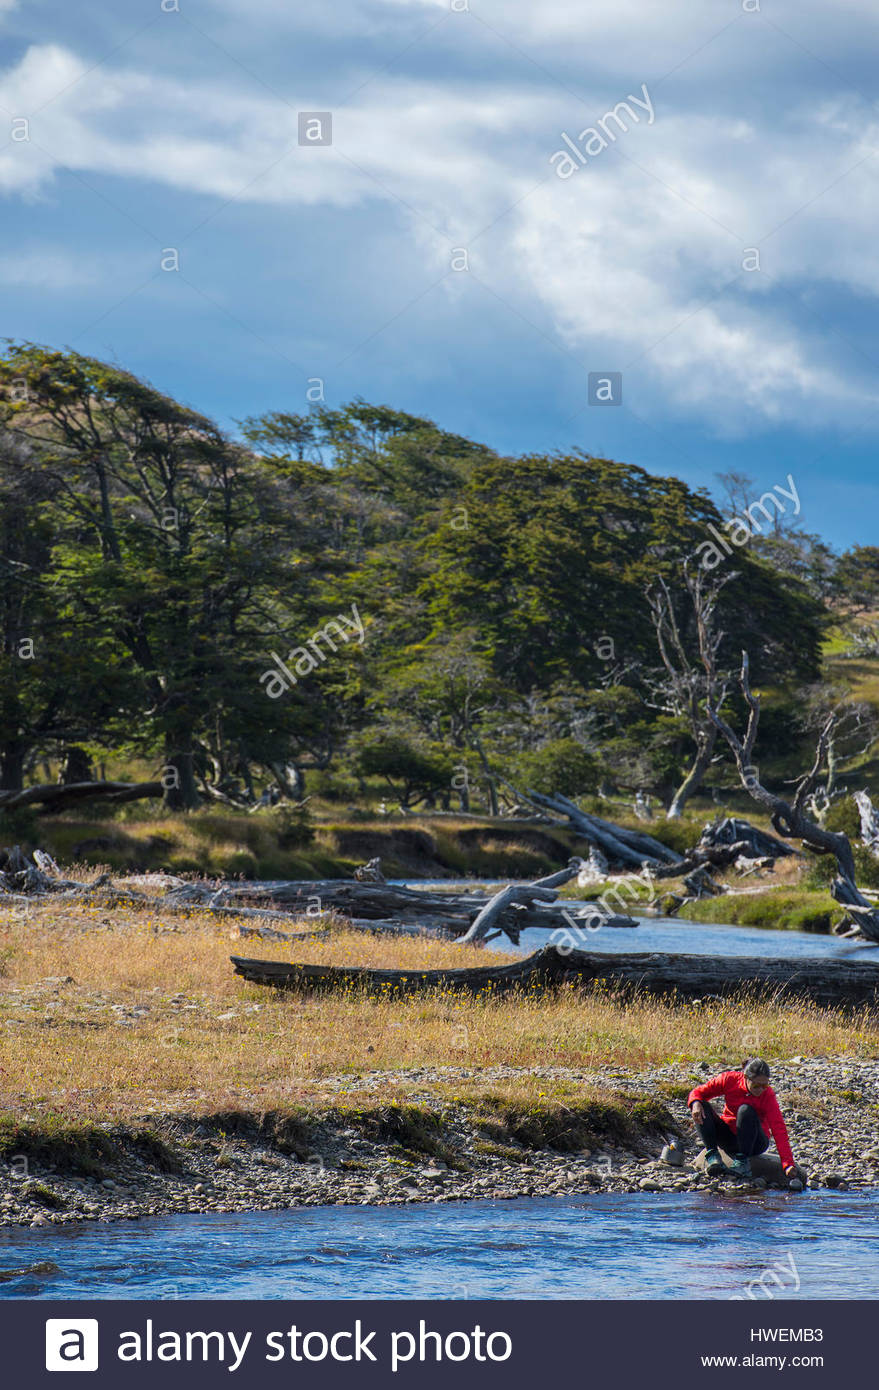 L'équipement de camping femme lave dans la rivière, Tierra del Fuego, Argentina Photo Stock